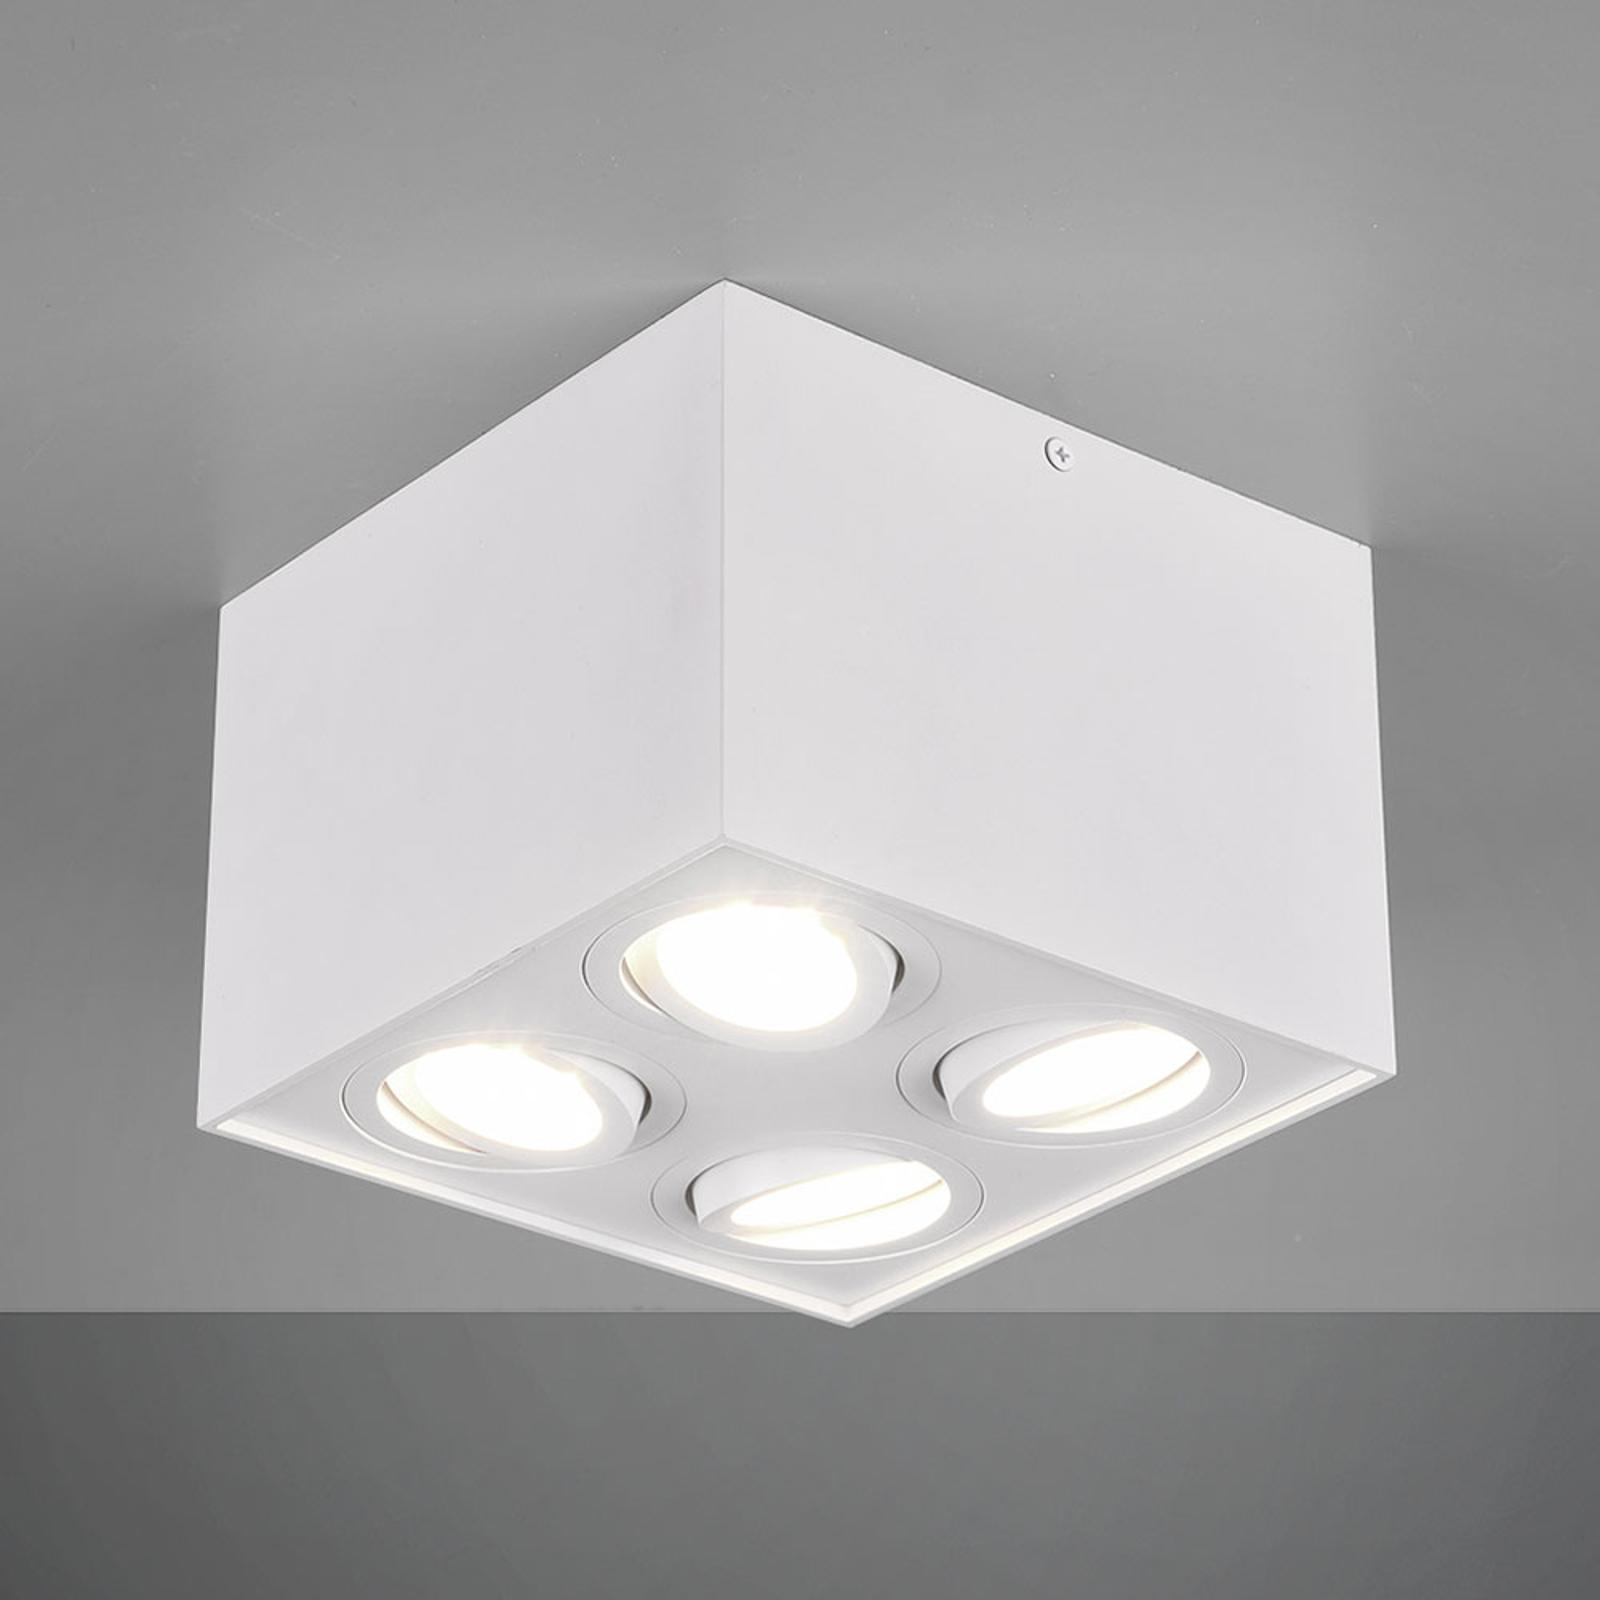 Lampa sufitowa Biscuit, 4-punktowa, biała